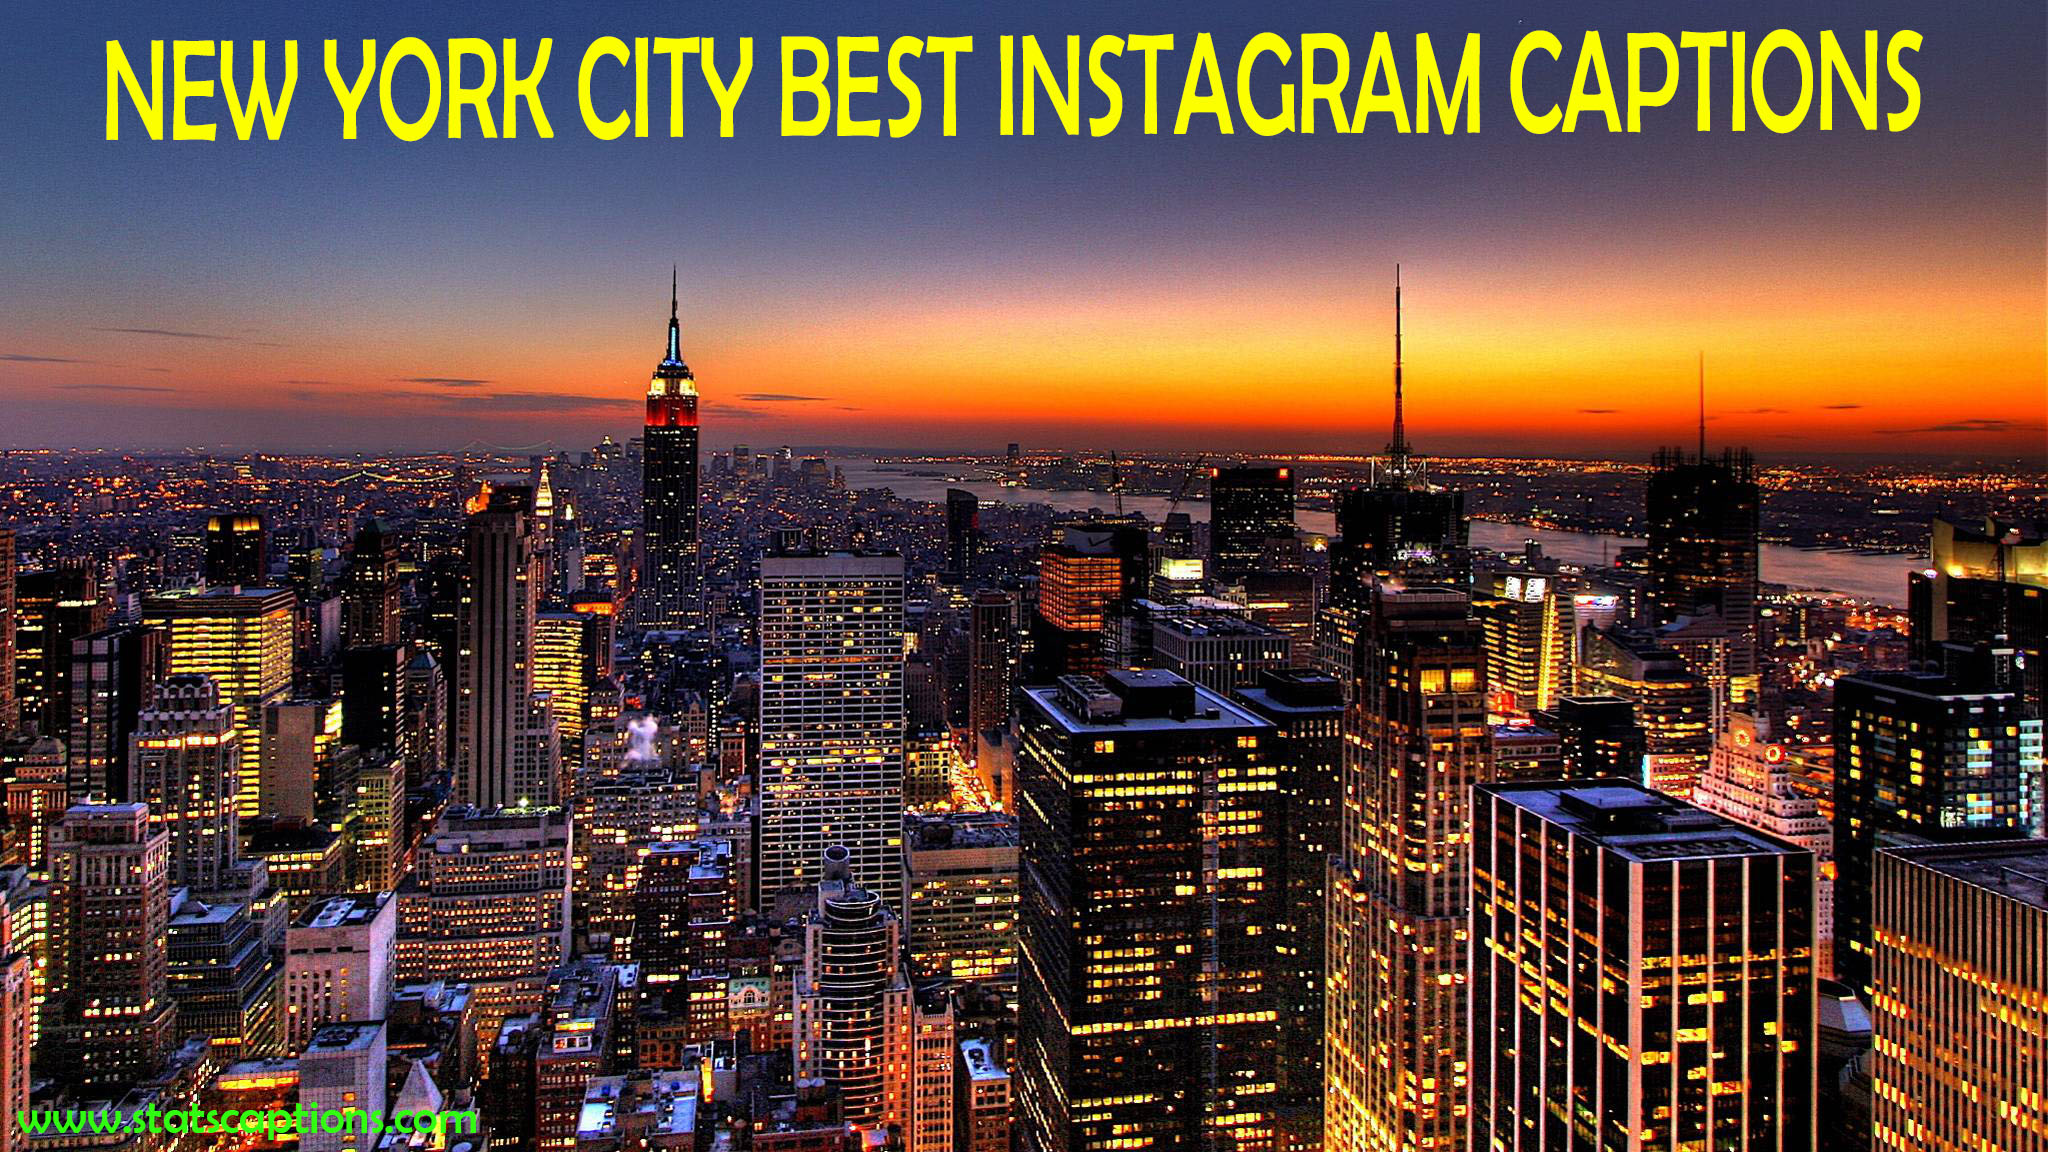 New York Instagram captions